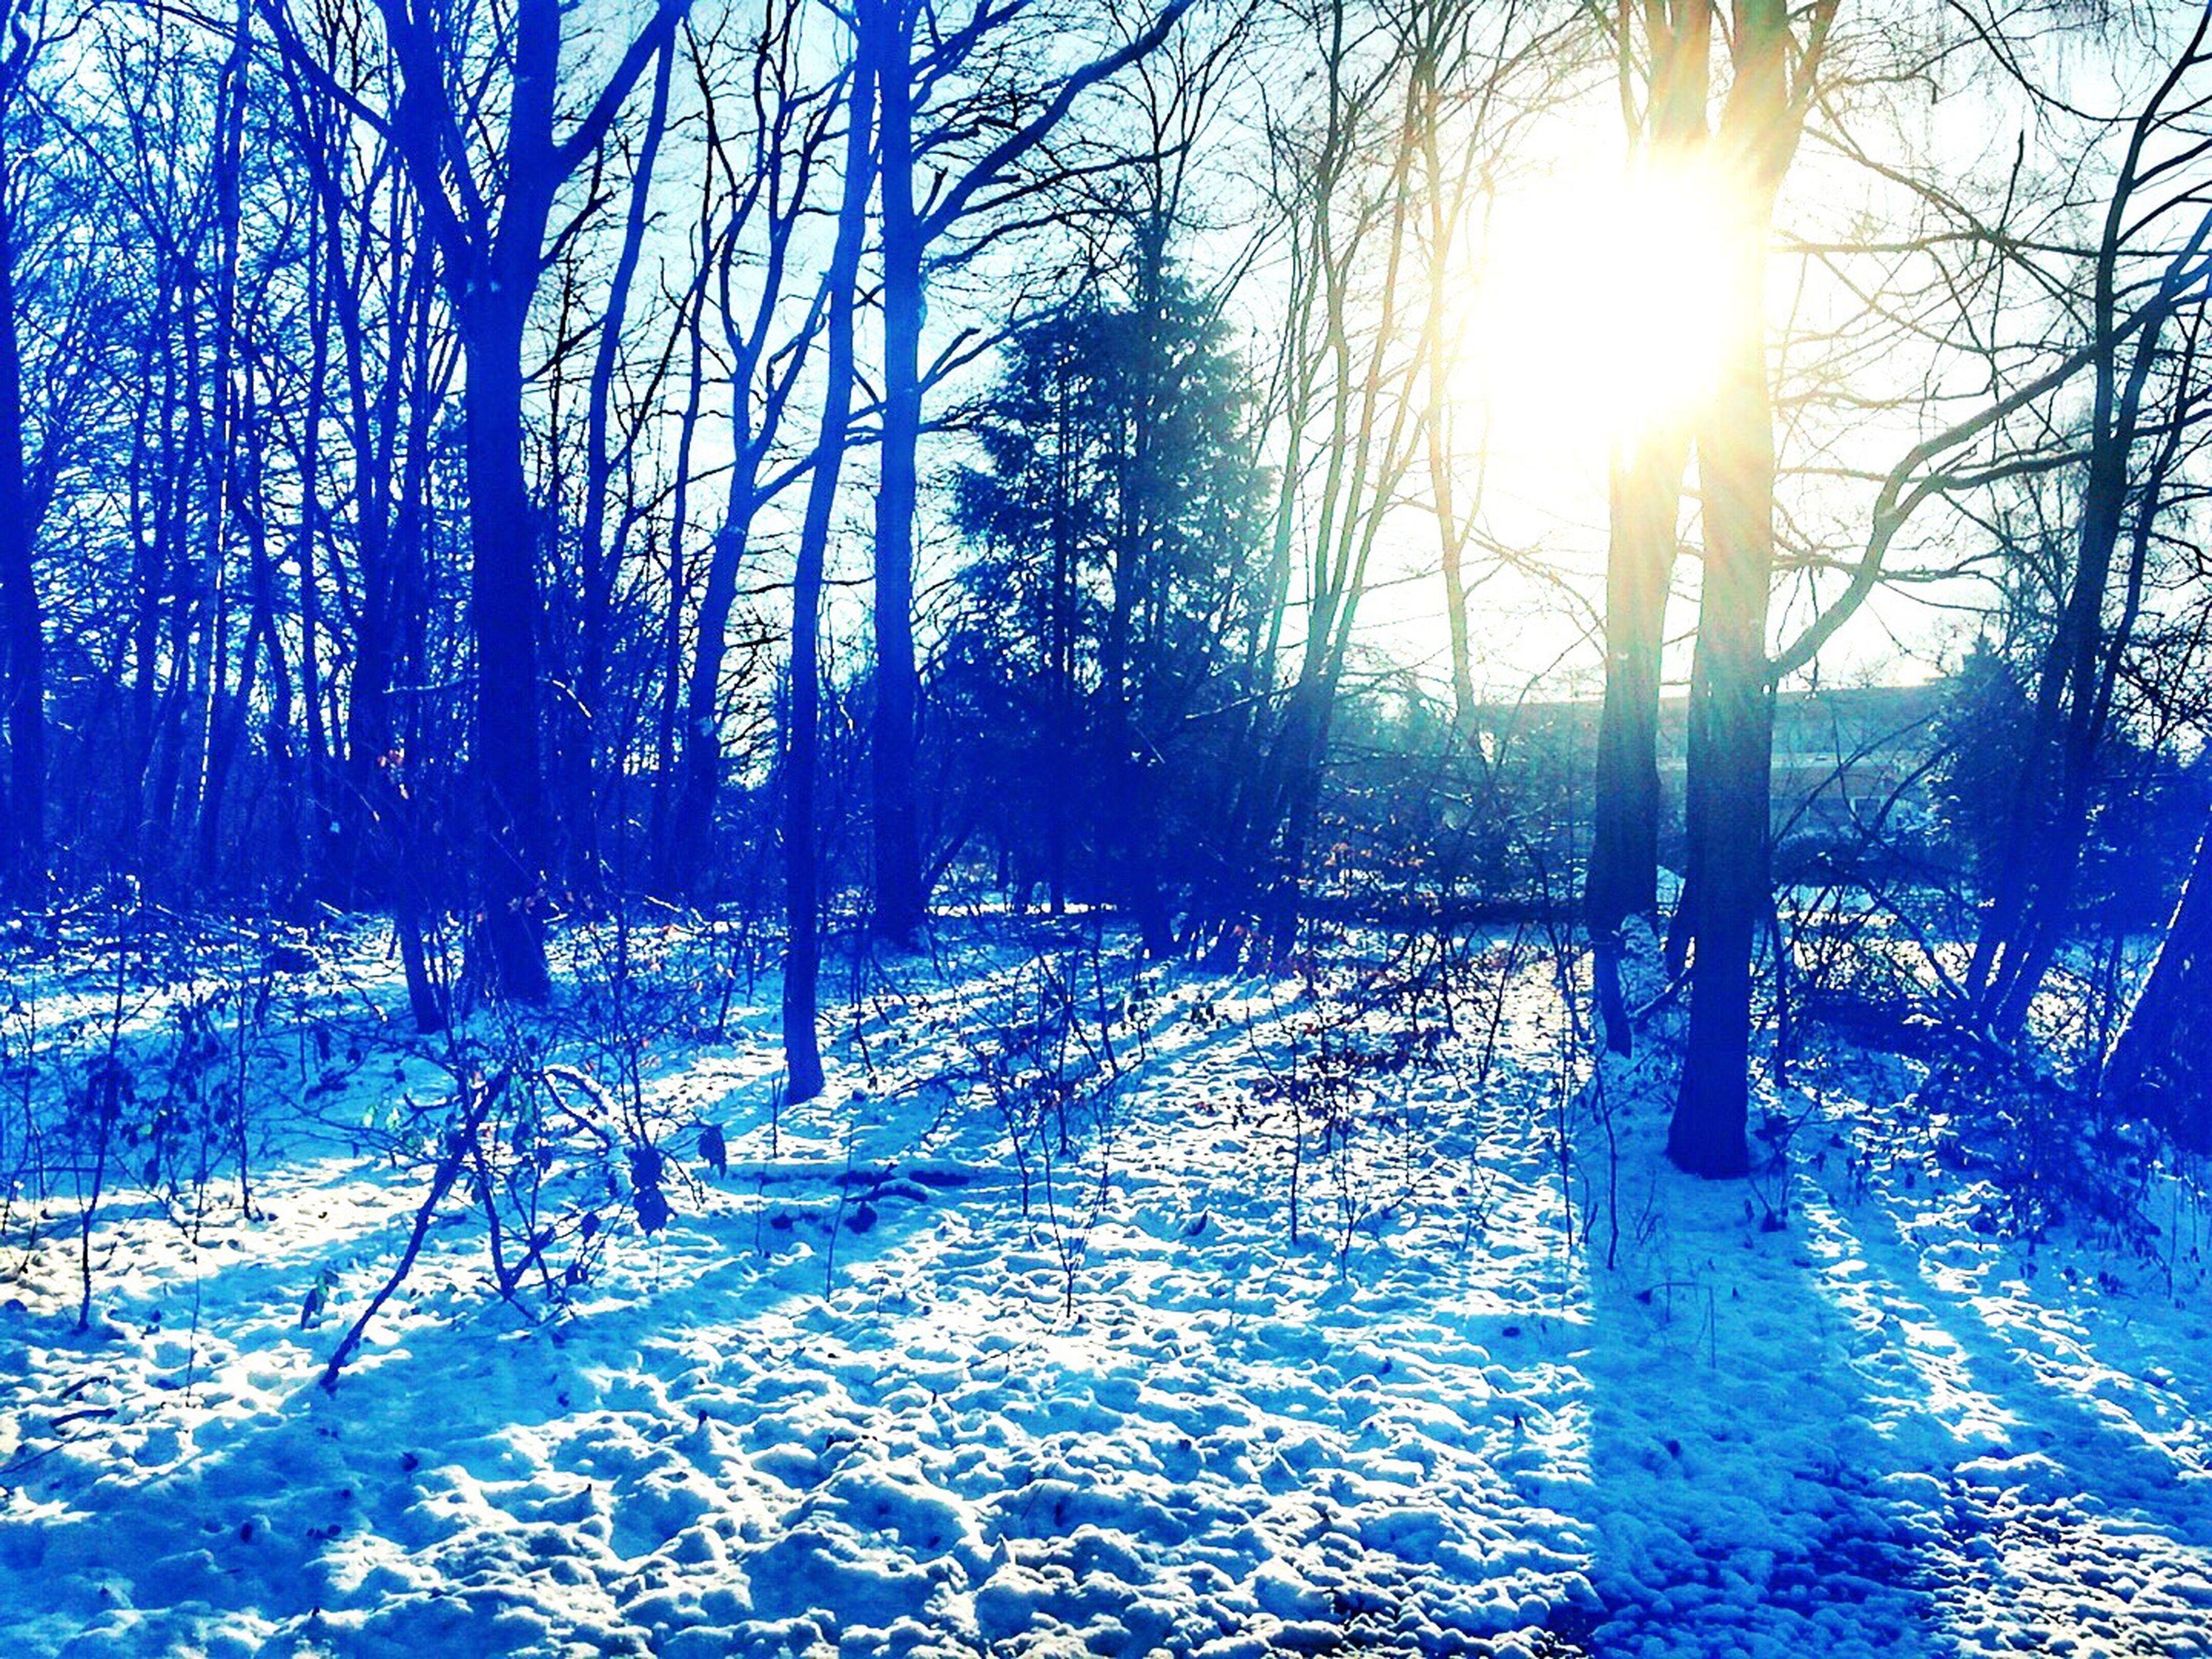 sun, winter, cold temperature, snow, sunlight, bare tree, tree, season, sunbeam, water, tranquility, nature, tranquil scene, lens flare, beauty in nature, scenics, shadow, bright, tree trunk, frozen